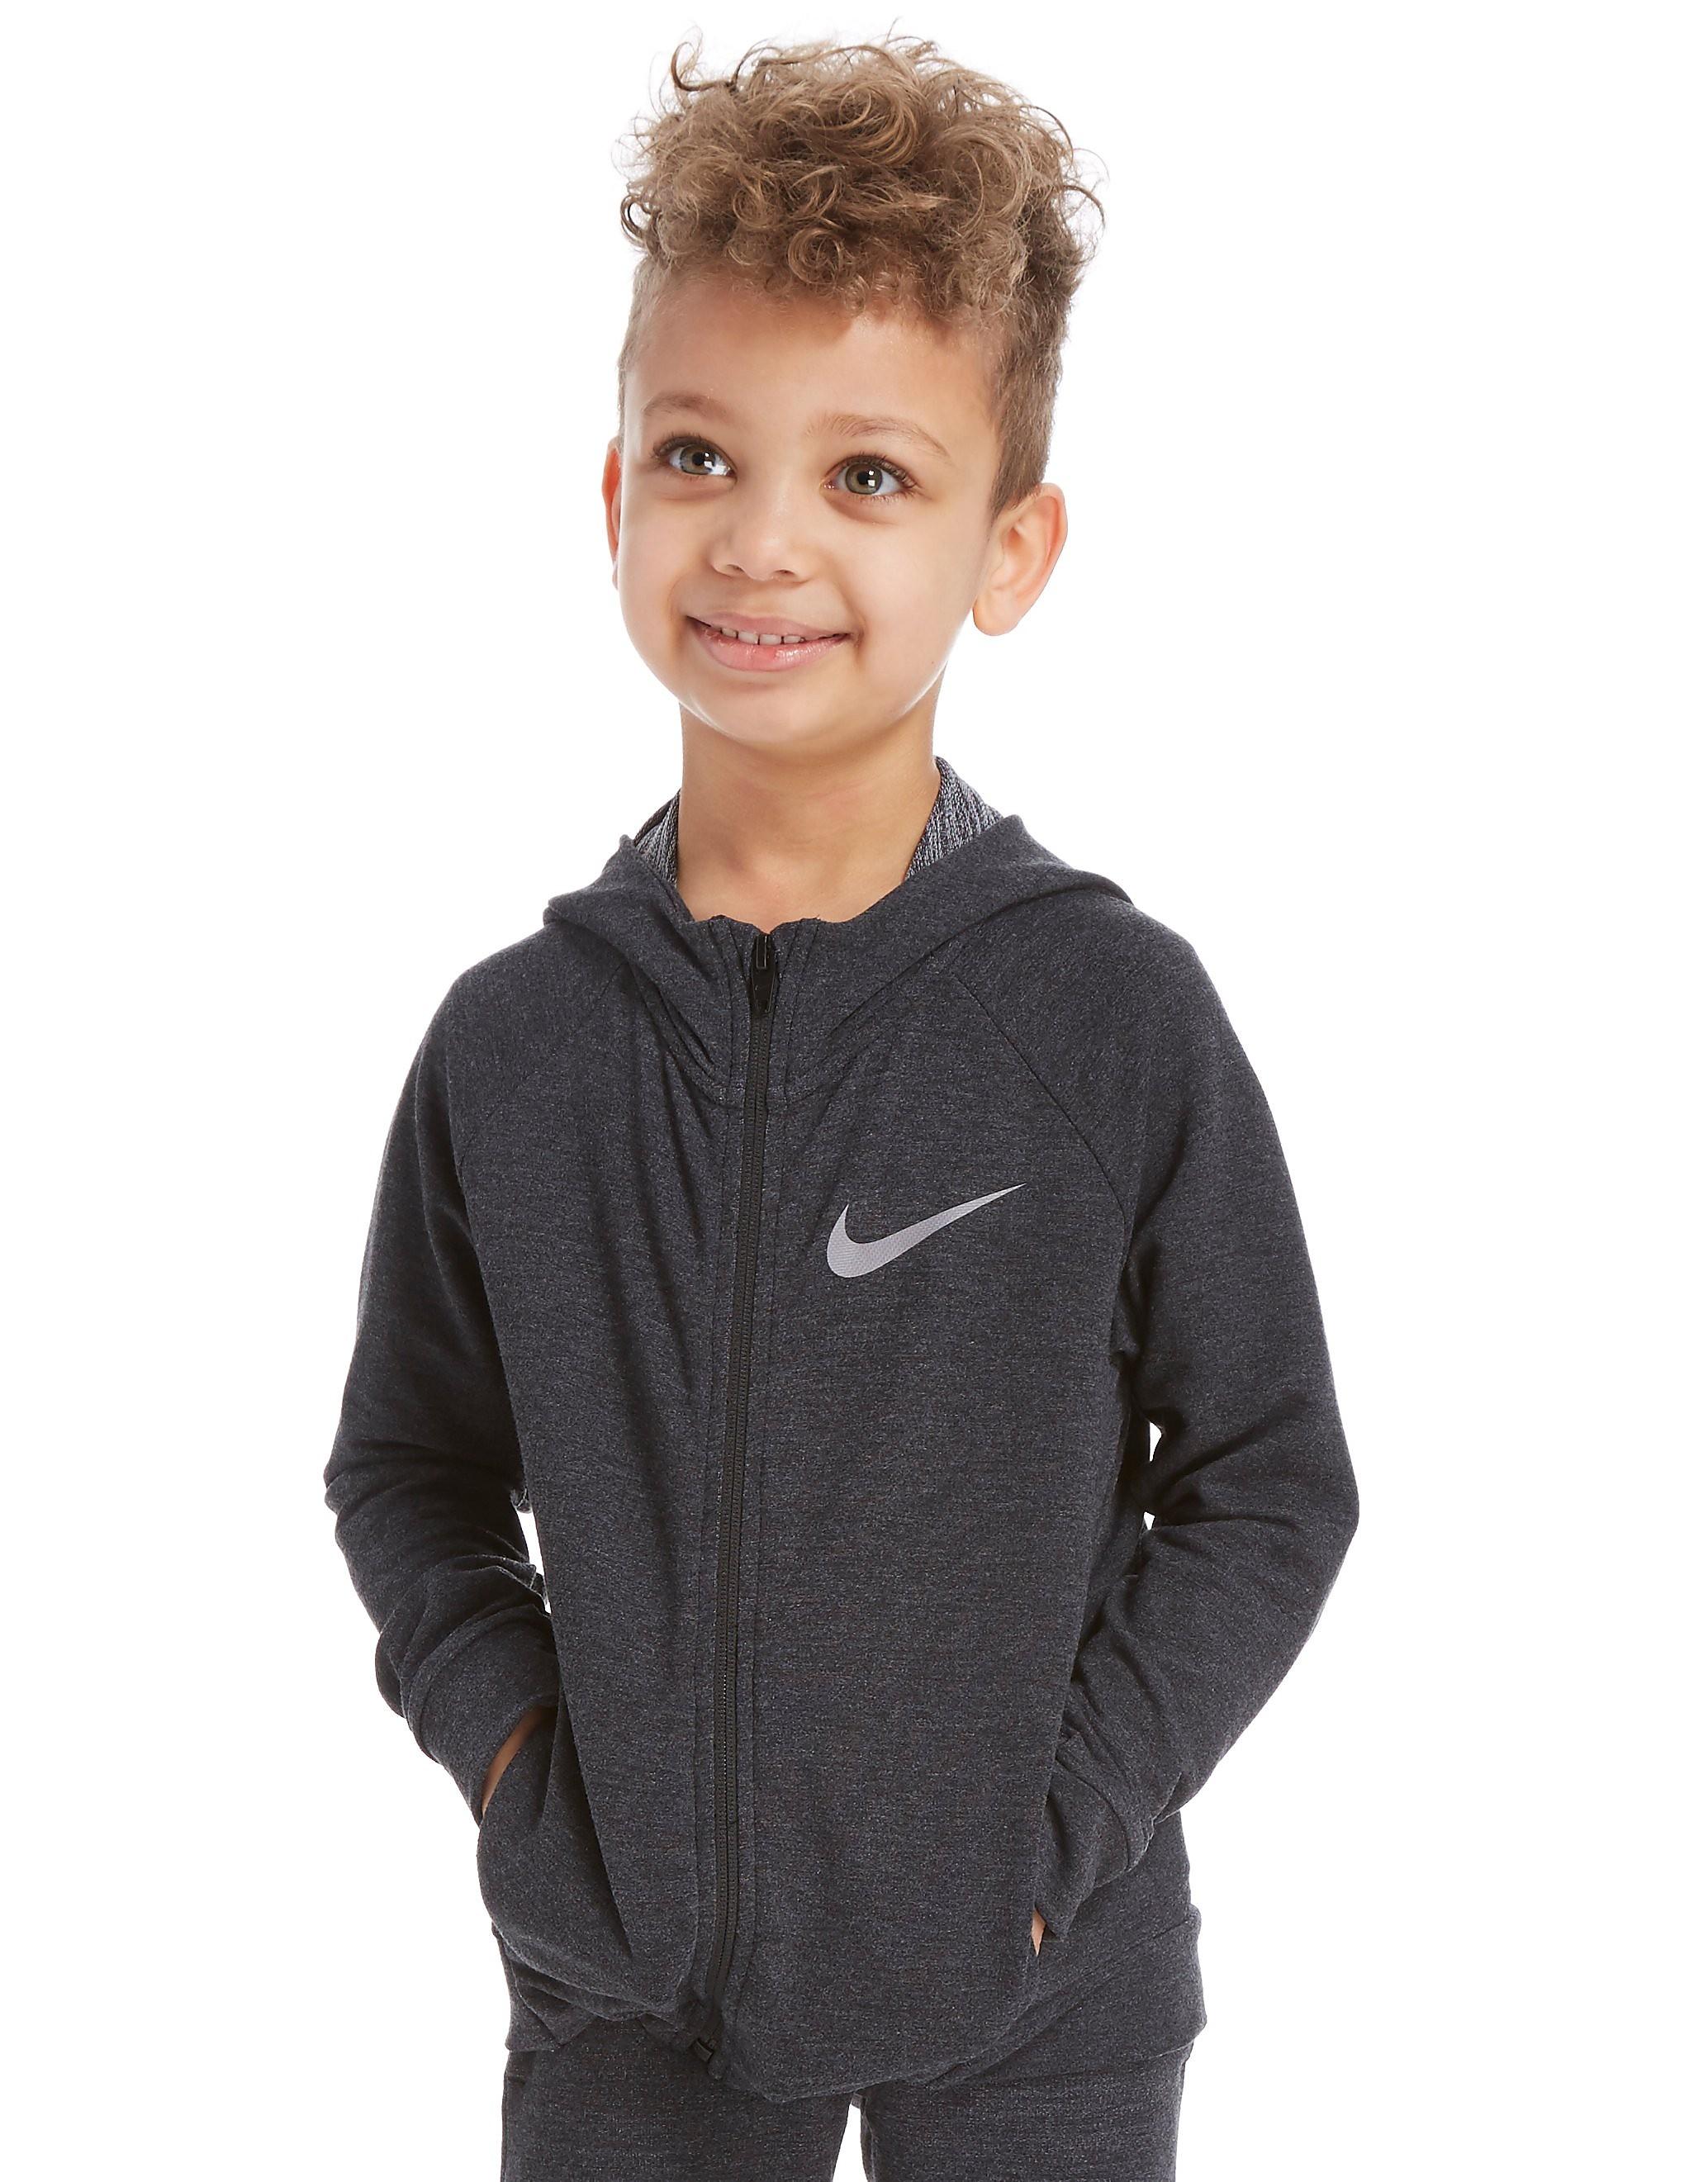 Nike chaqueta con capucha Dri-FIT infantil